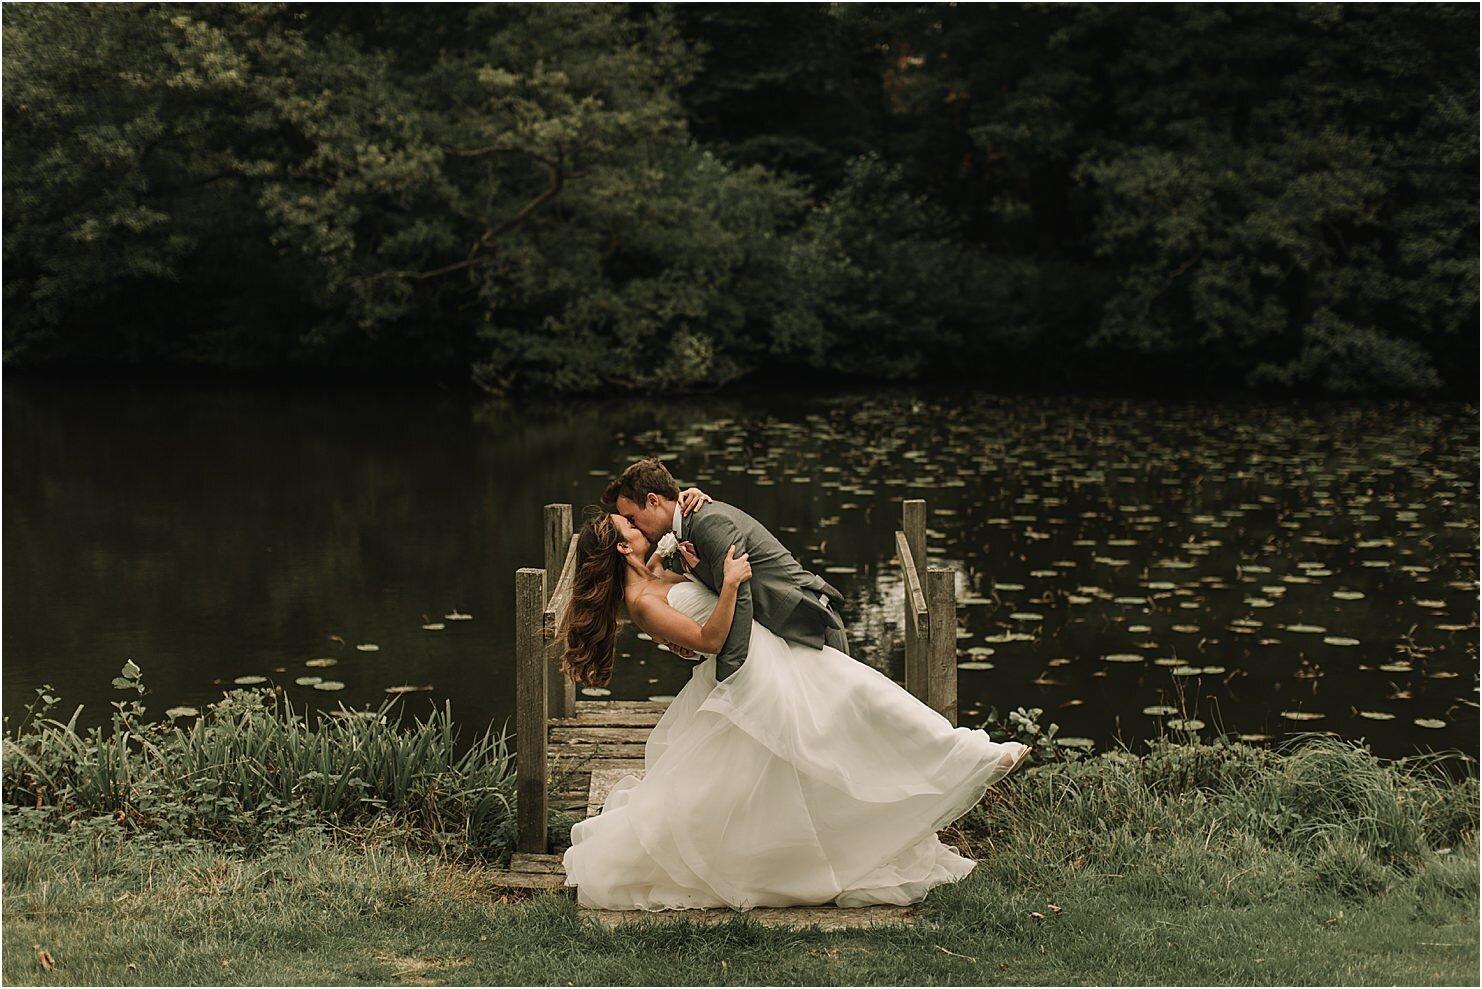 boda-de-cuento-en-castillo-boda-en-londres-71.jpg